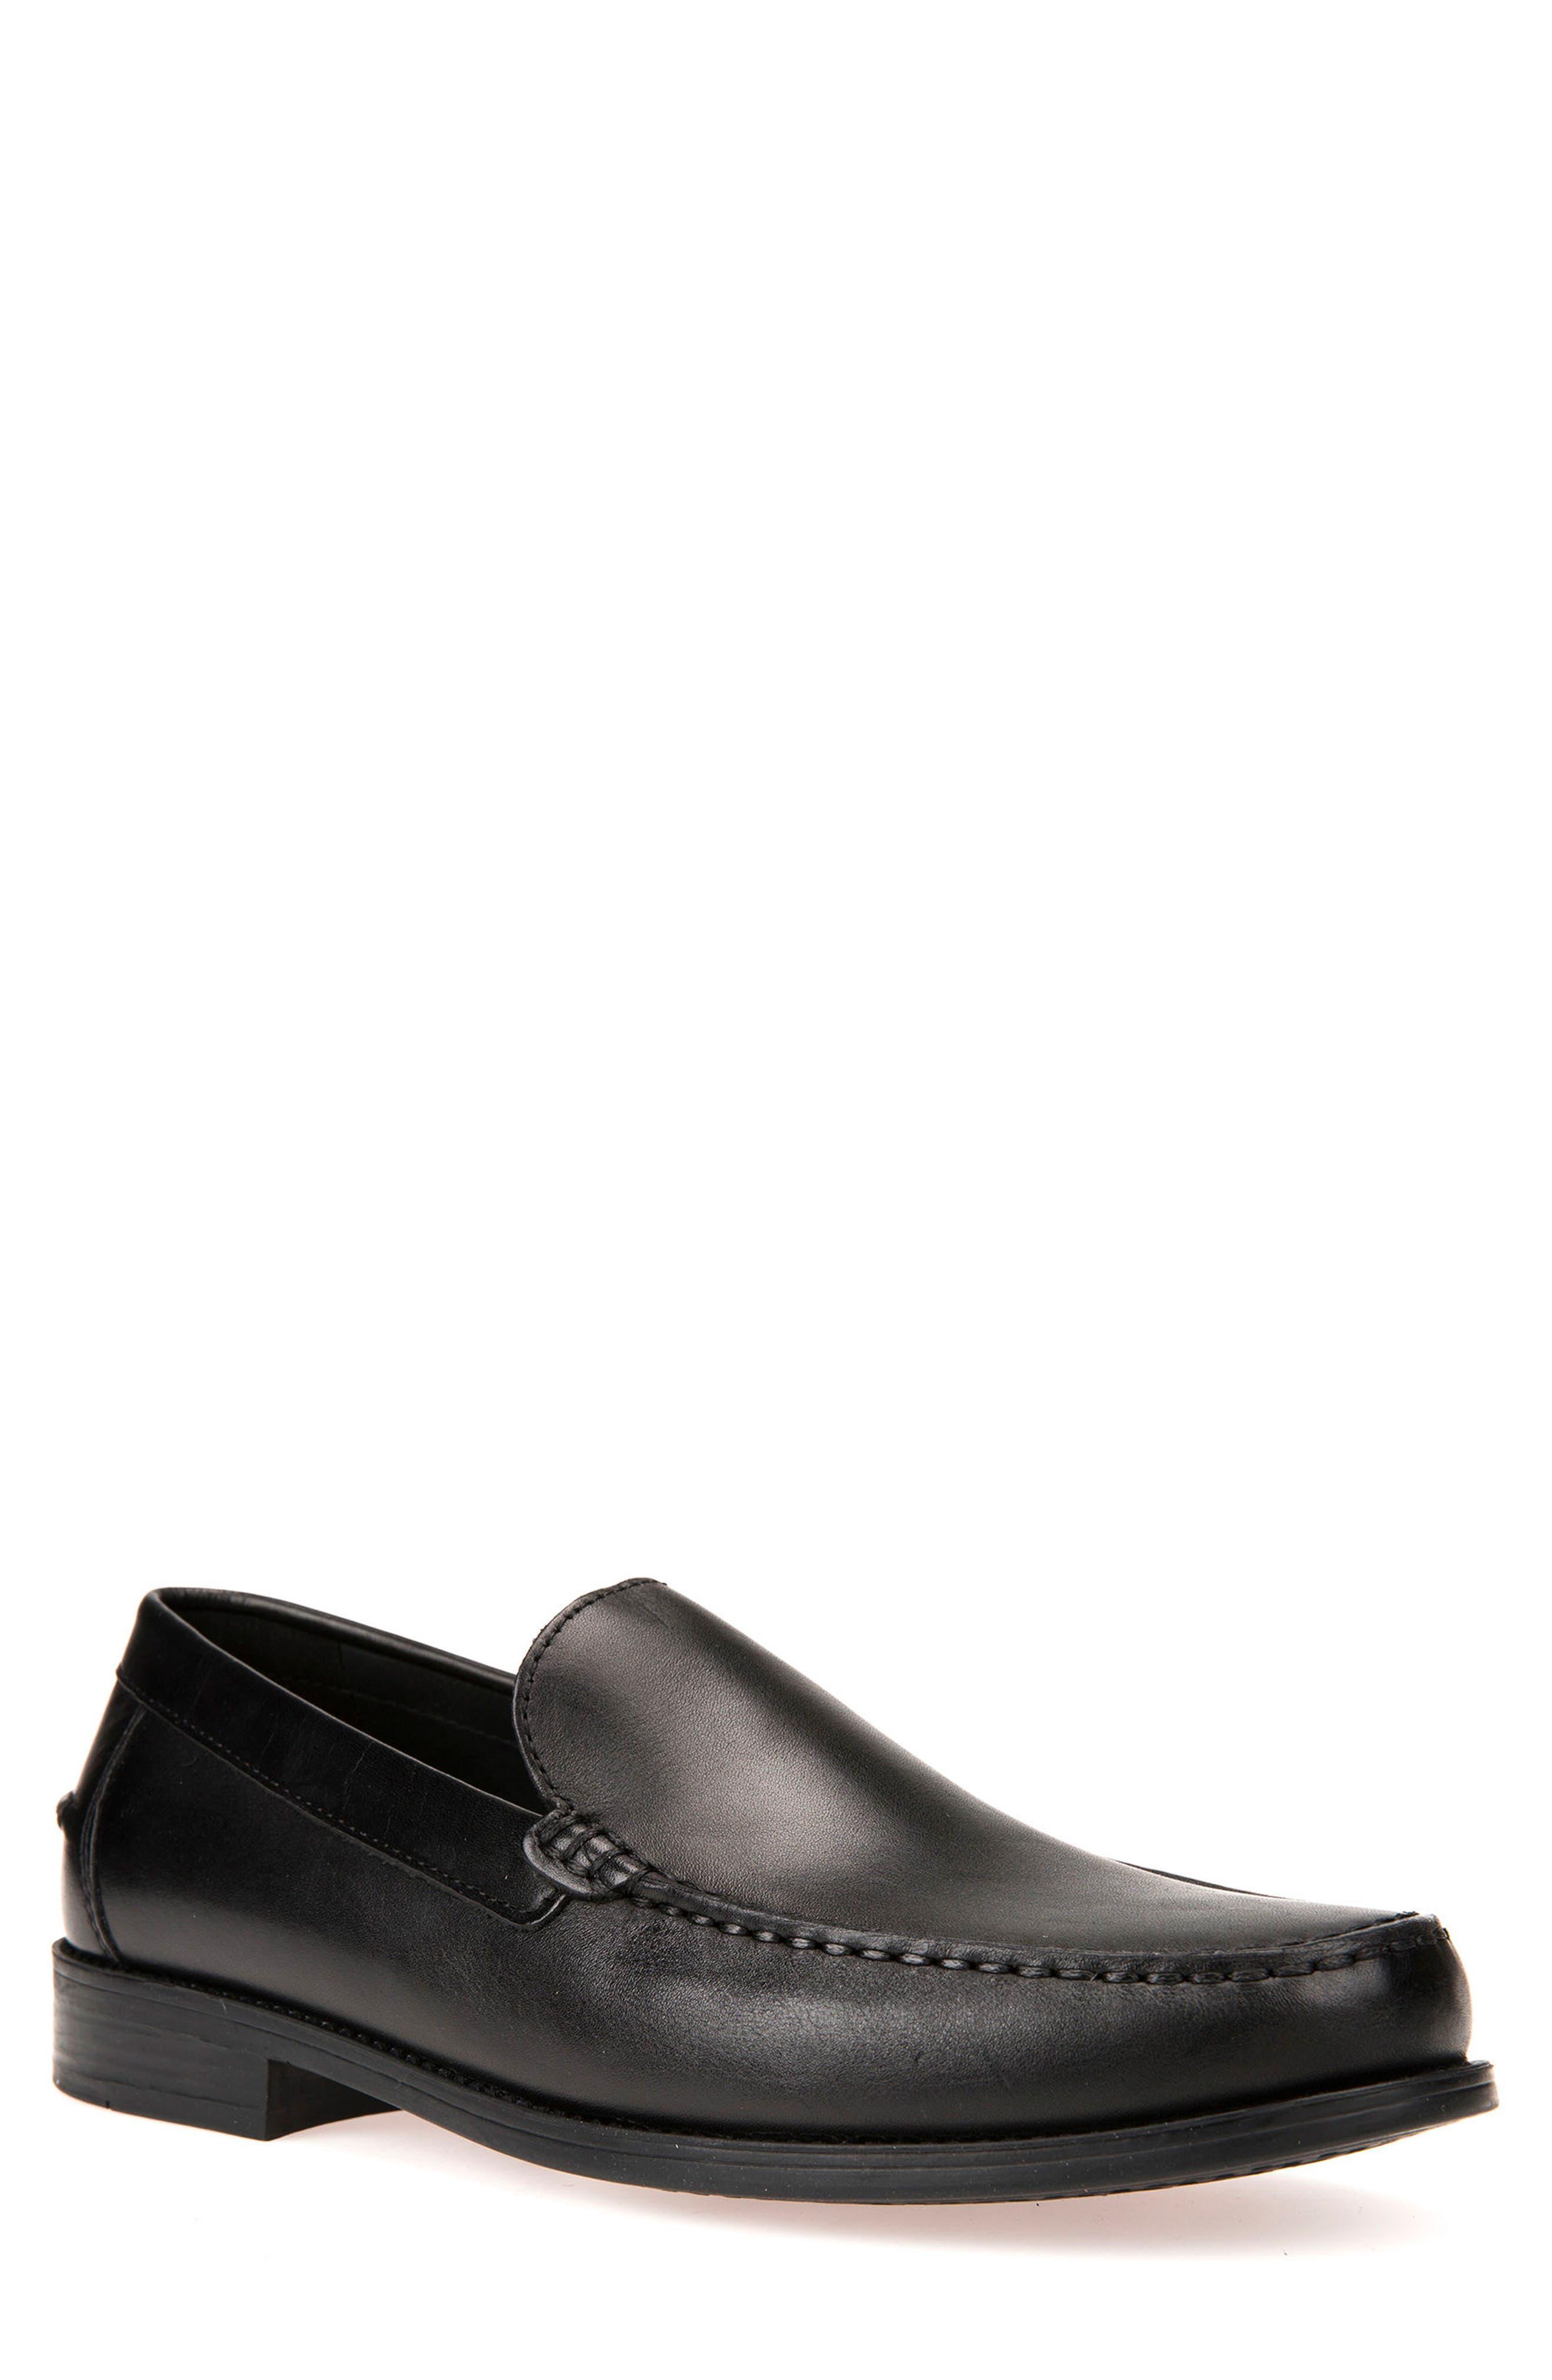 GEOX, New Damon 2 Venetian Slip-On Shoe, Main thumbnail 1, color, BLACK LEATHER